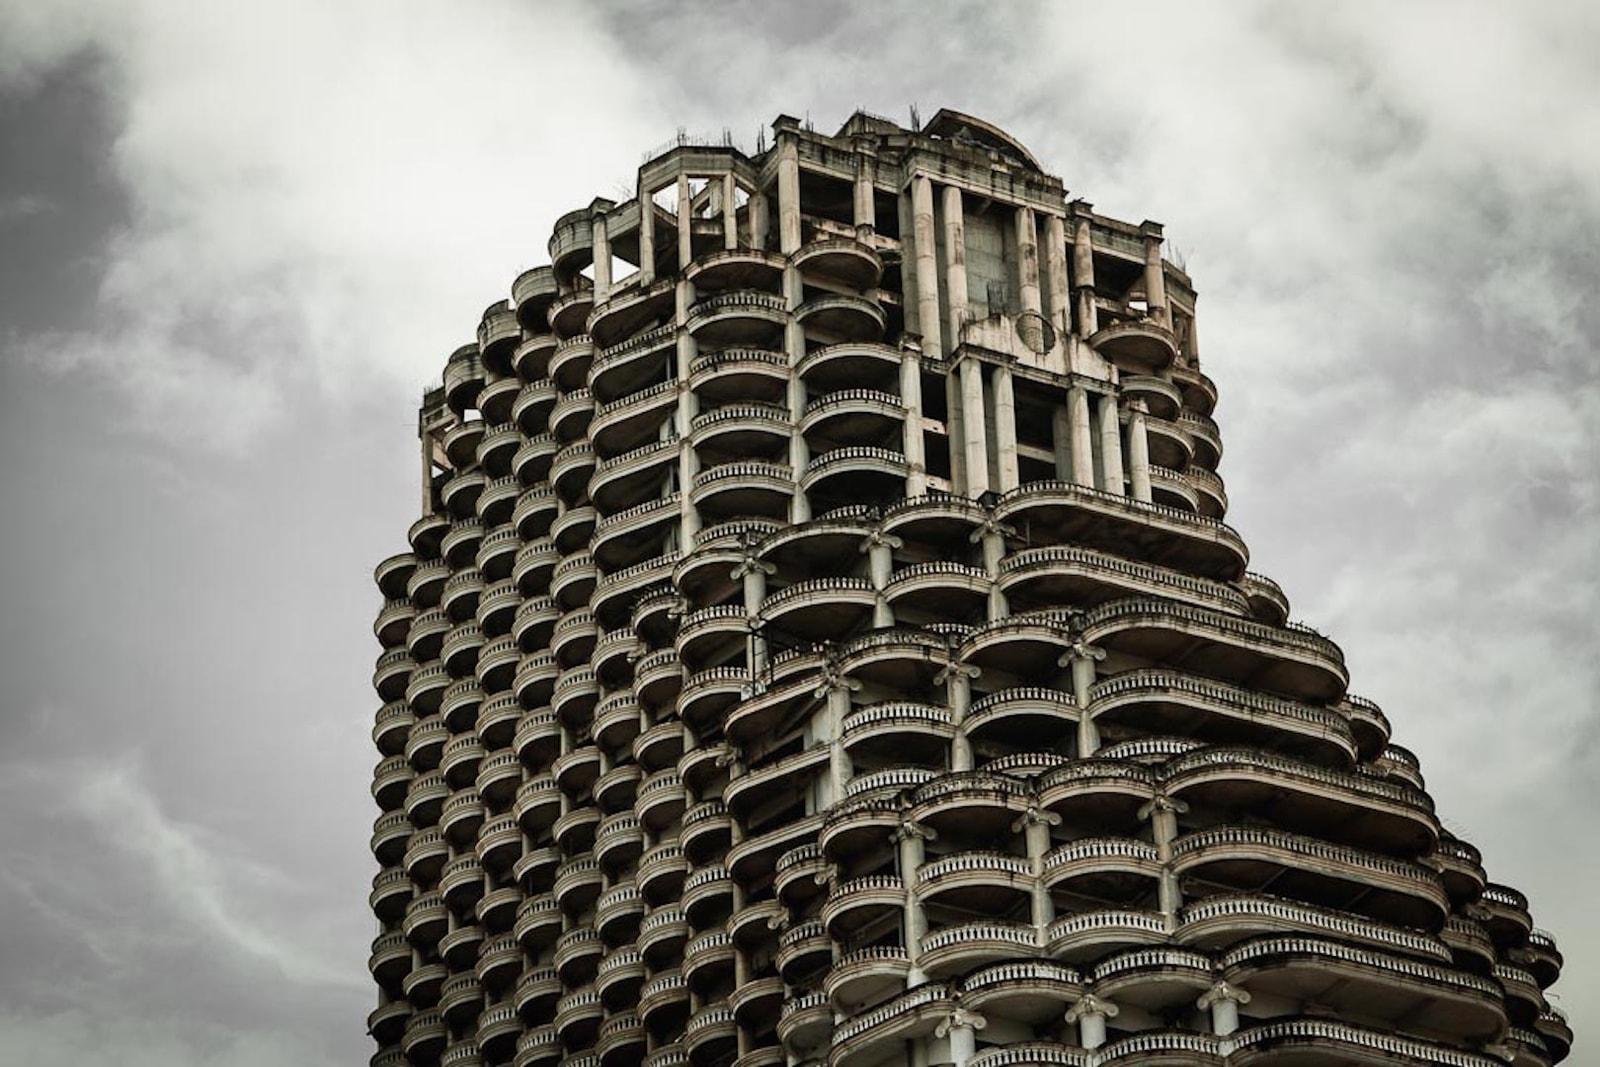 5 Instagram-Friendly Haunted & Abandoned Buildings ghosts halloween